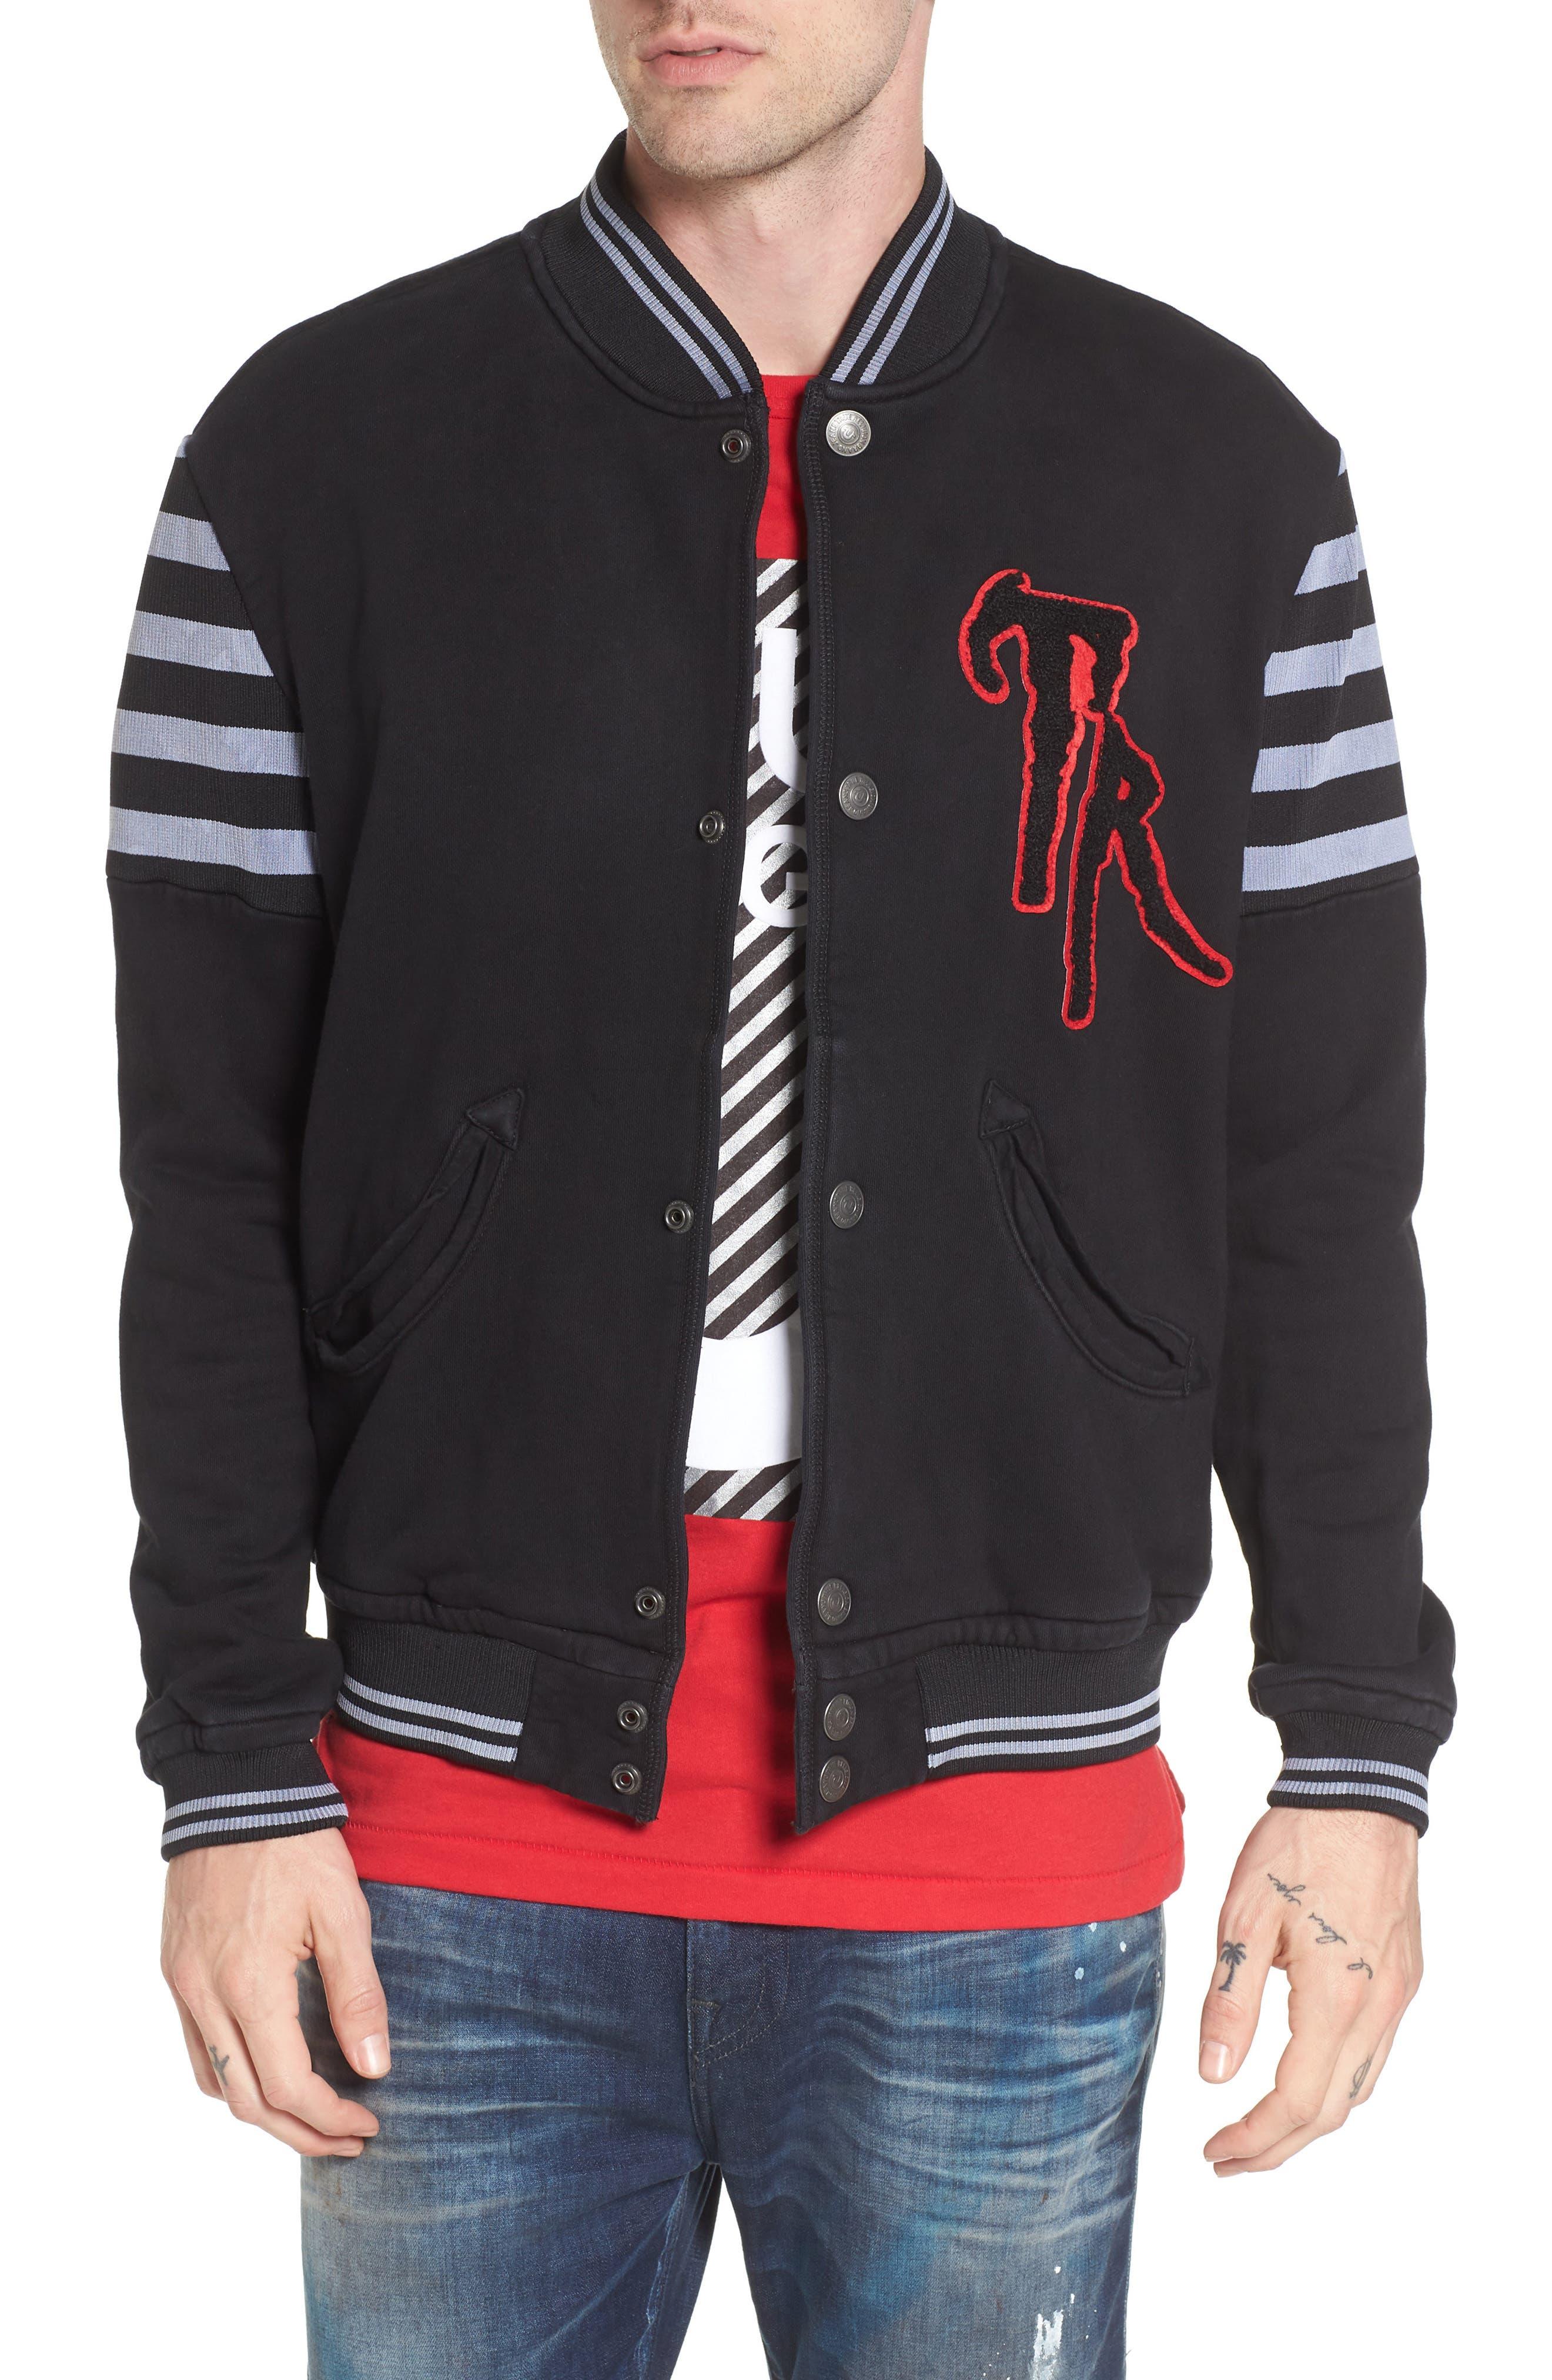 Collegiate Knit Inset Jacket,                             Main thumbnail 1, color,